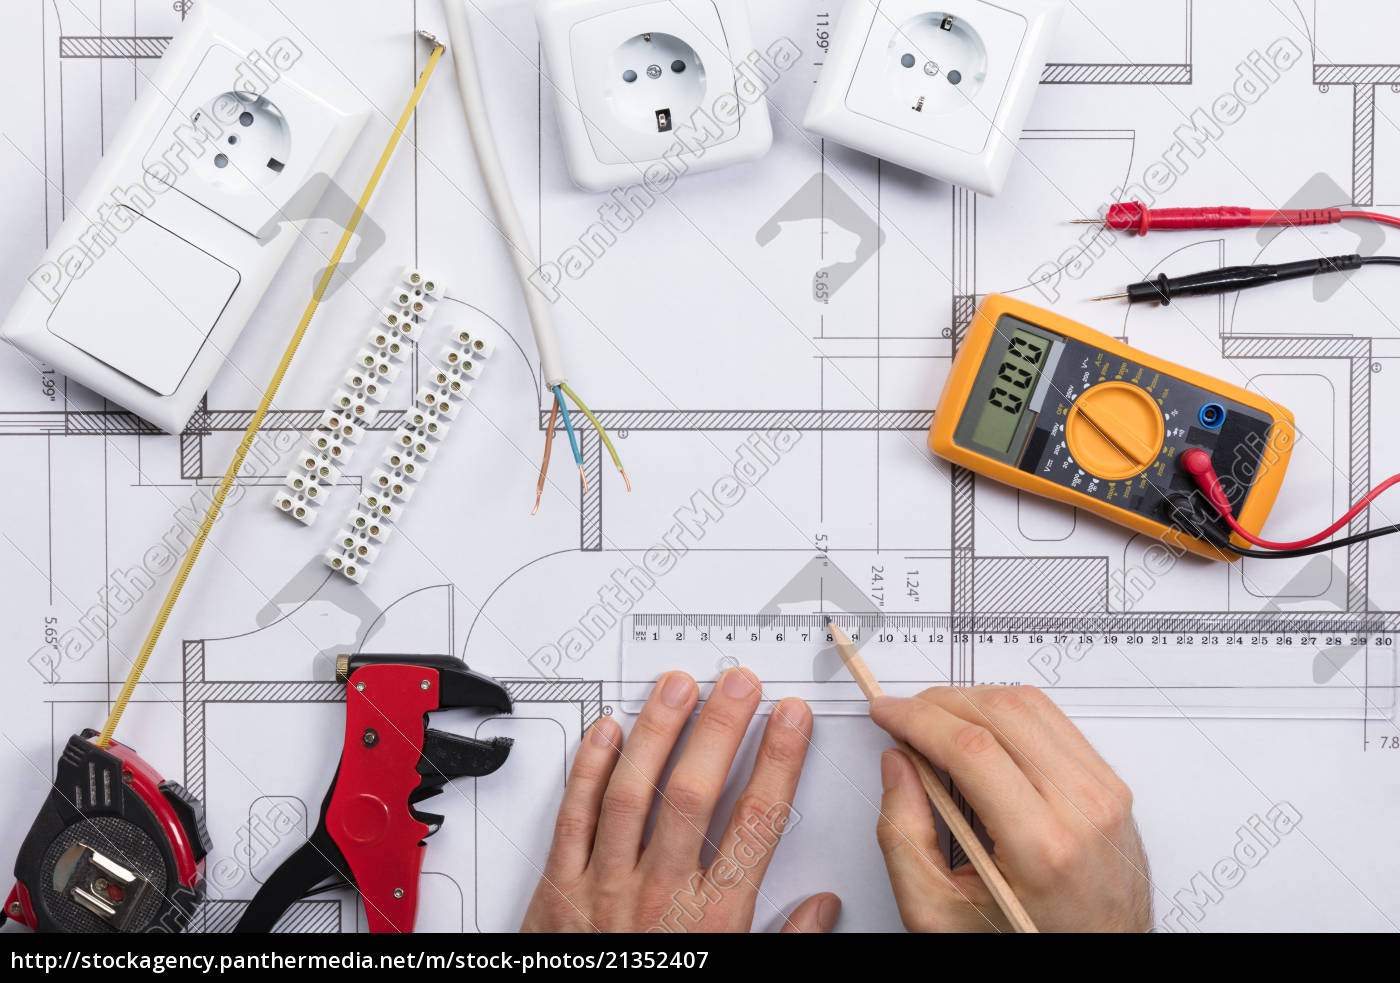 Royalty free image 21352407 - Architect Drawing Plan On Blueprint With on siding blueprints, machining blueprints, design blueprints, welding fabrication blueprints, engine blueprints, water heater blueprints, plumbing blueprints, industrial blueprints, mechanical blueprints, electronic blueprints, house blueprints, countertop blueprints, manufacturing blueprints, hydraulic blueprints, engineering blueprints, home blueprints, foundation blueprints, structural blueprints, automotive blueprints, computer blueprints,